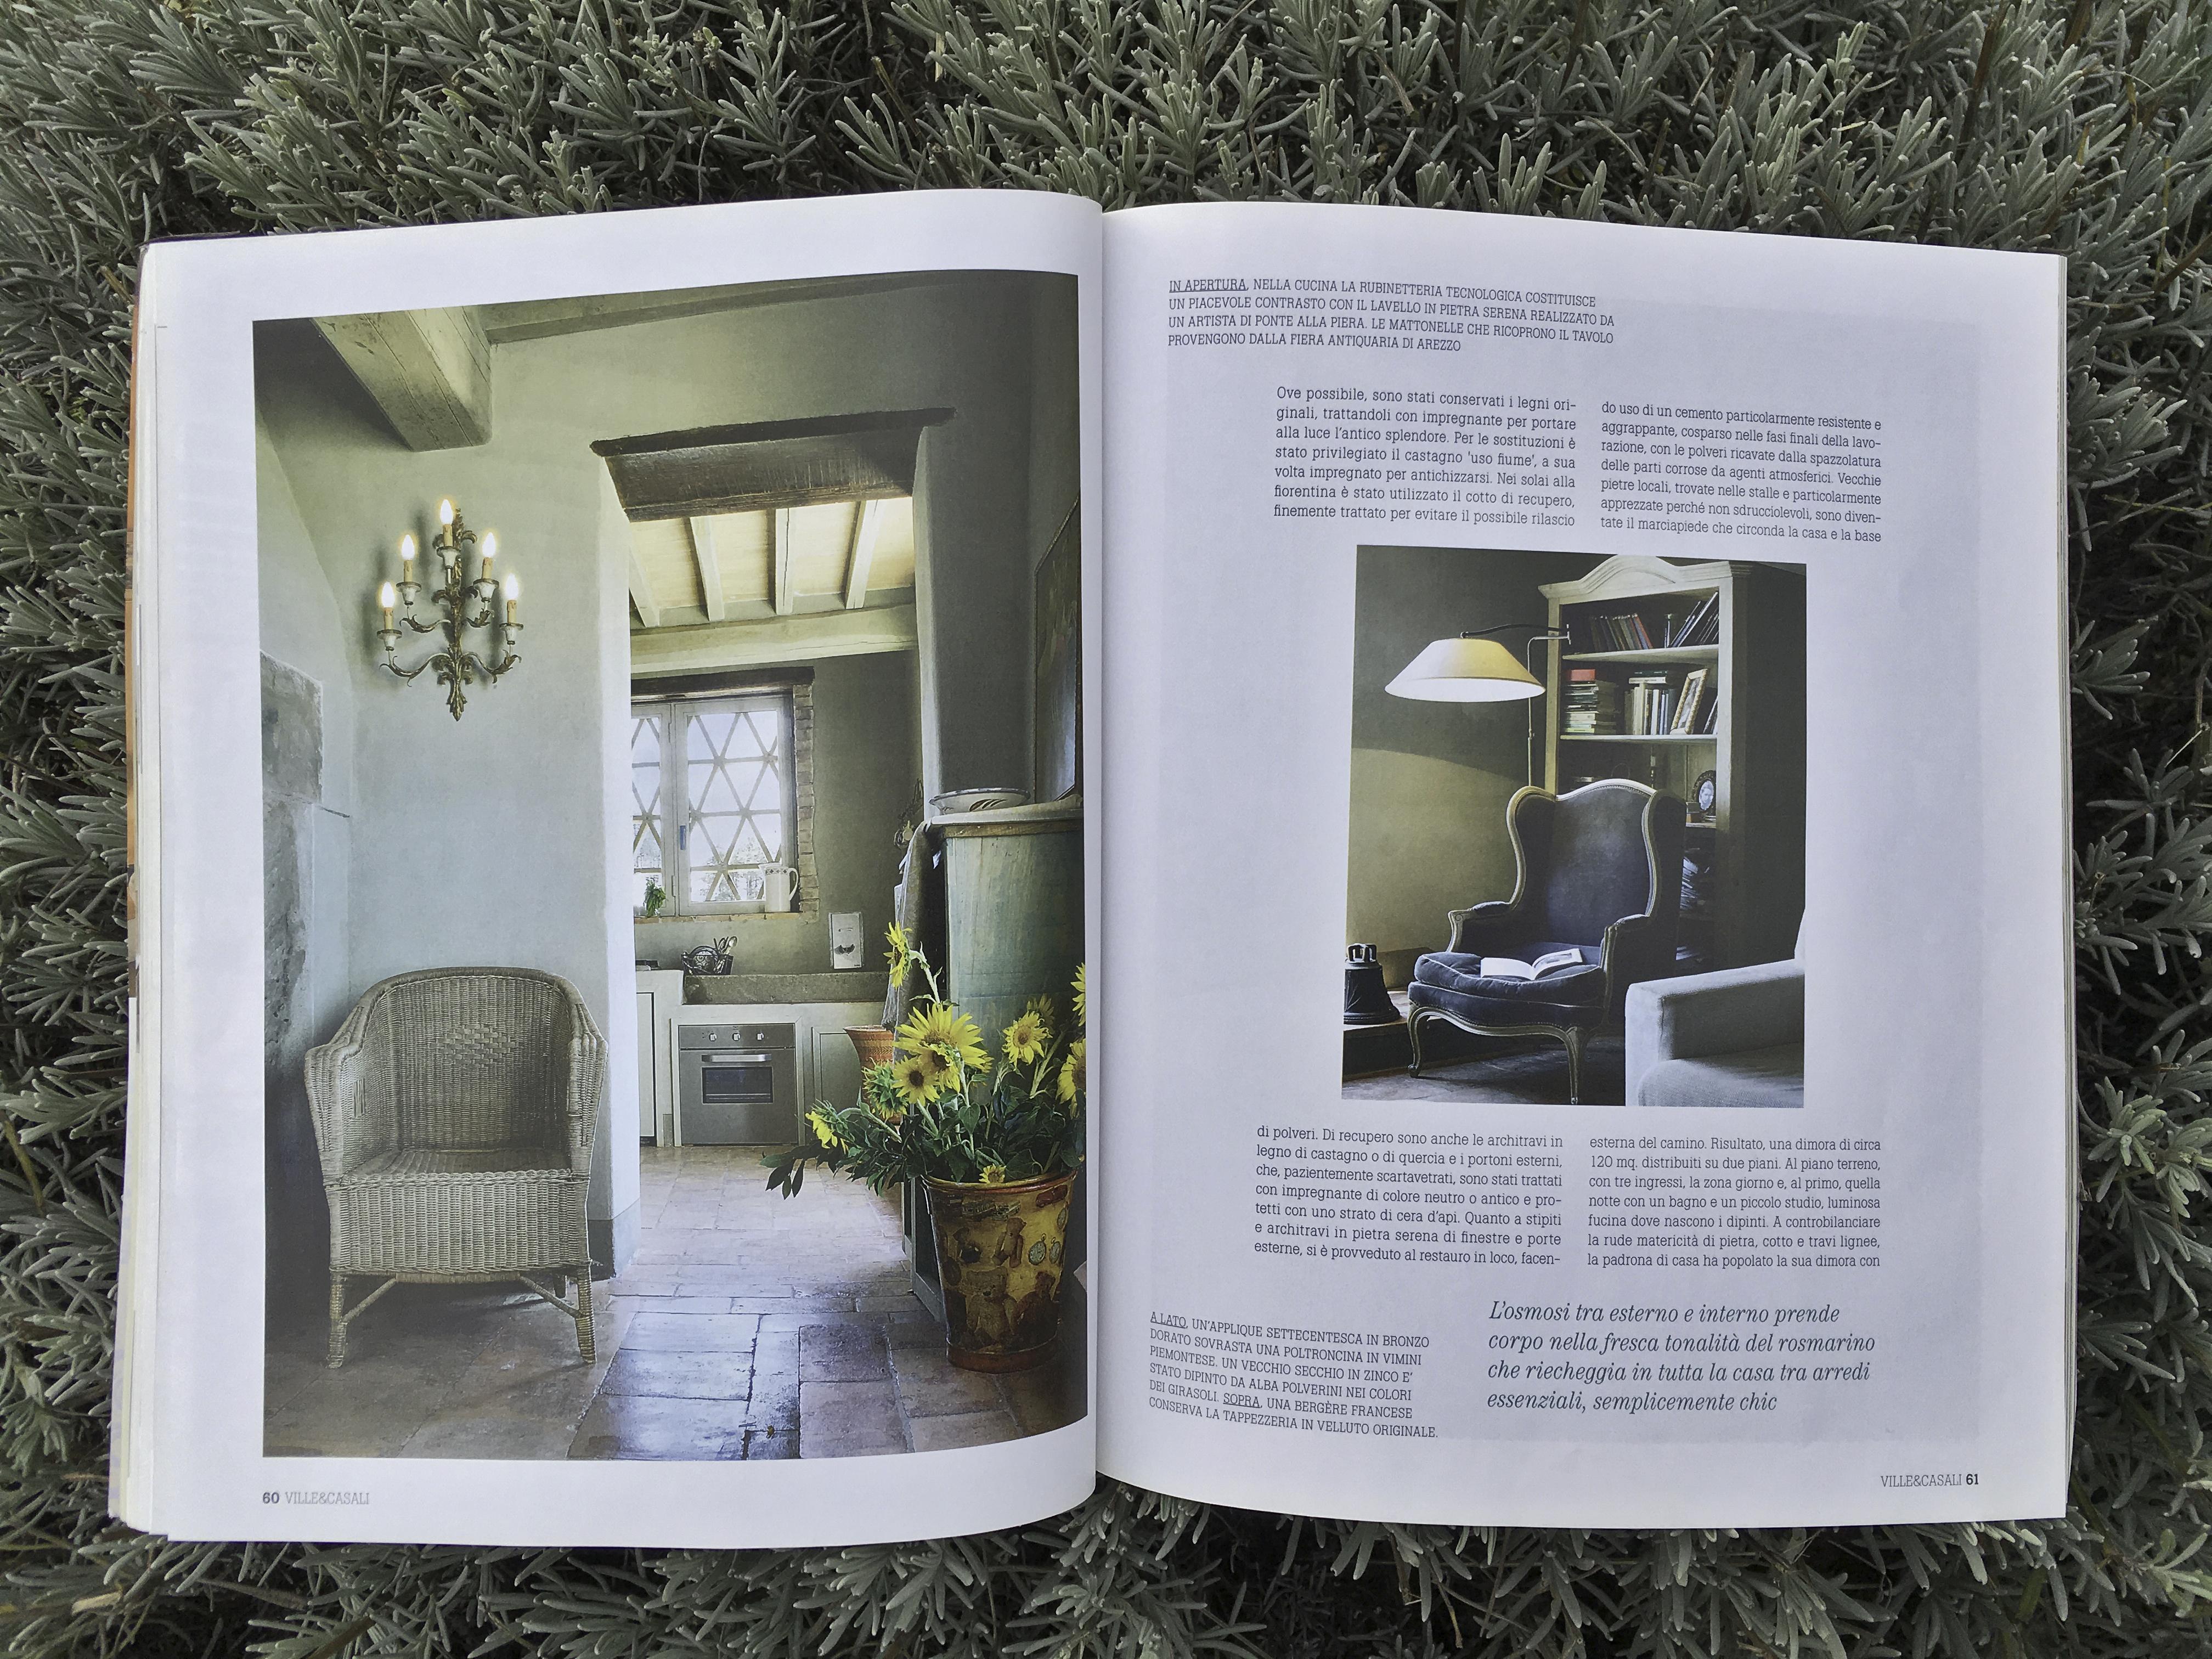 Camino Per La Casa casa del rosmarino - houses for rent in anghiari, toscana, italy